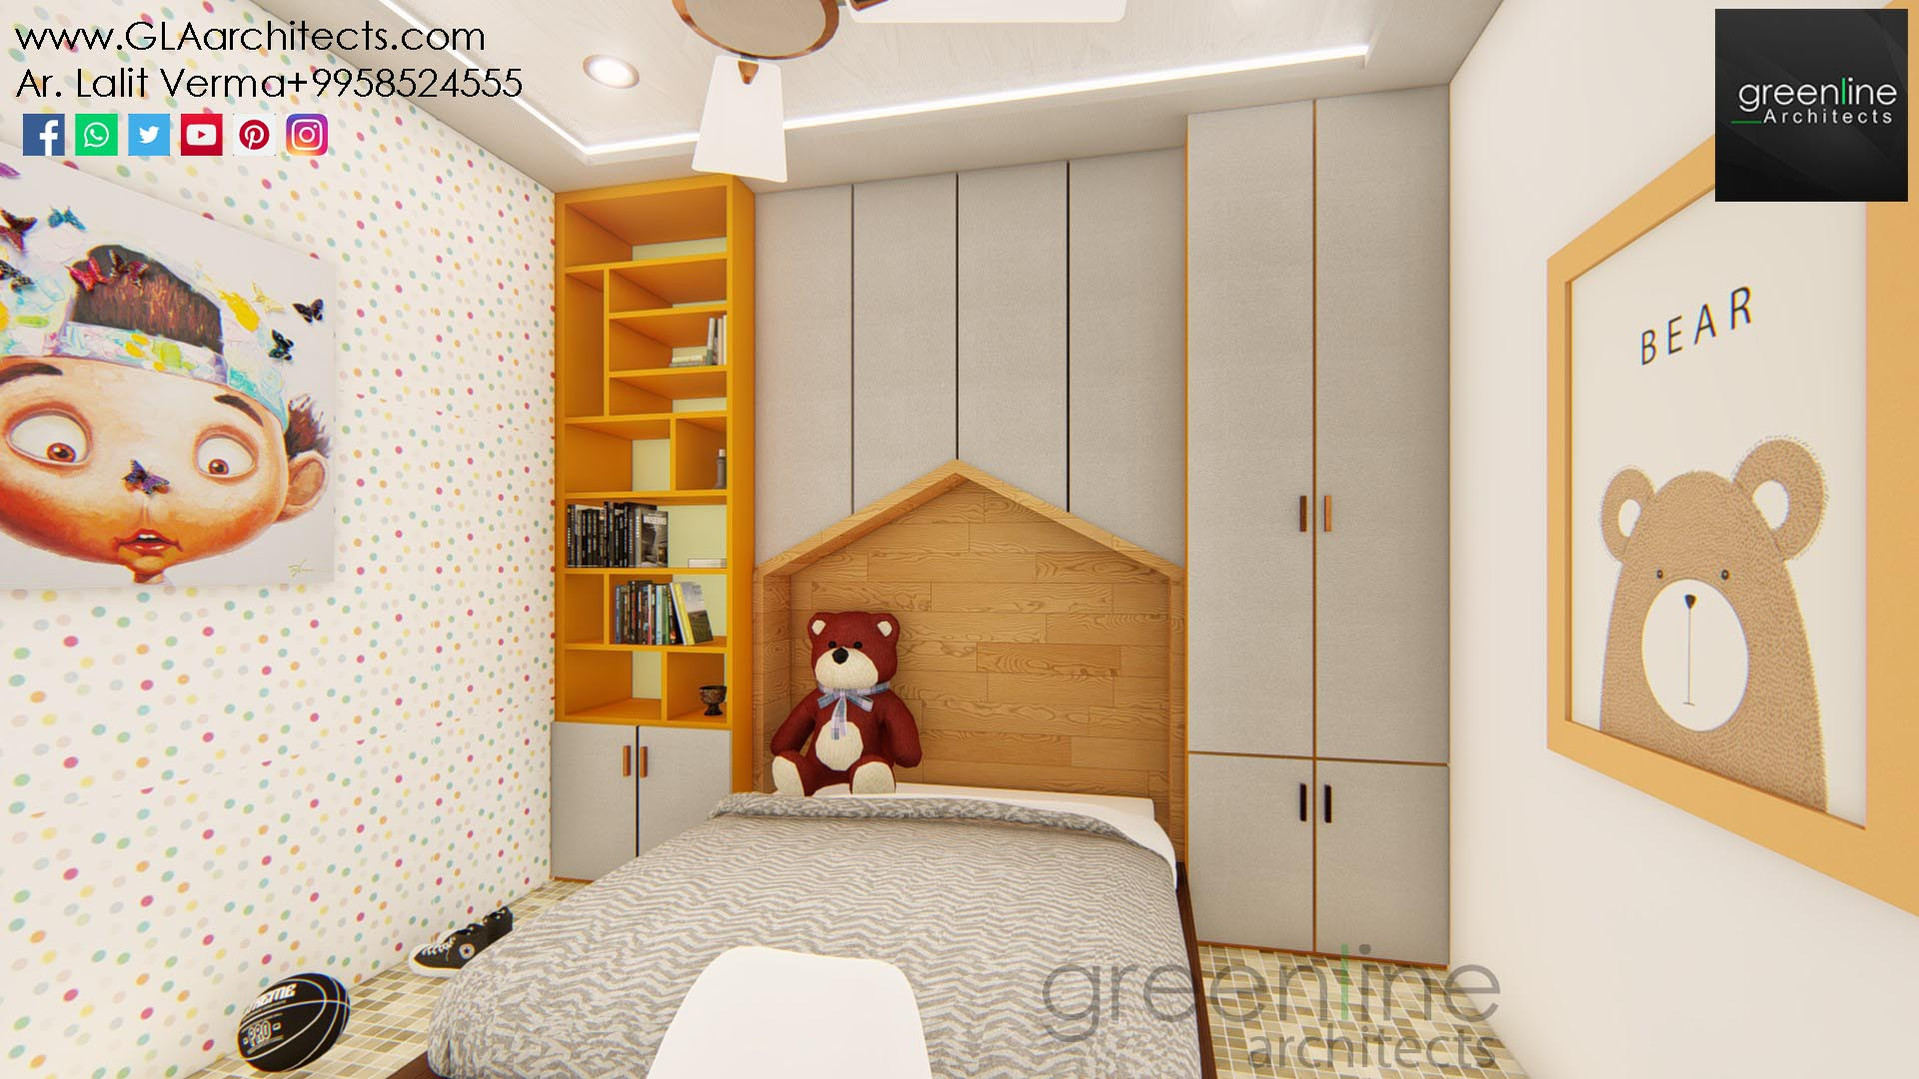 3 BHK-Apartment_Home Interior (13).jpg